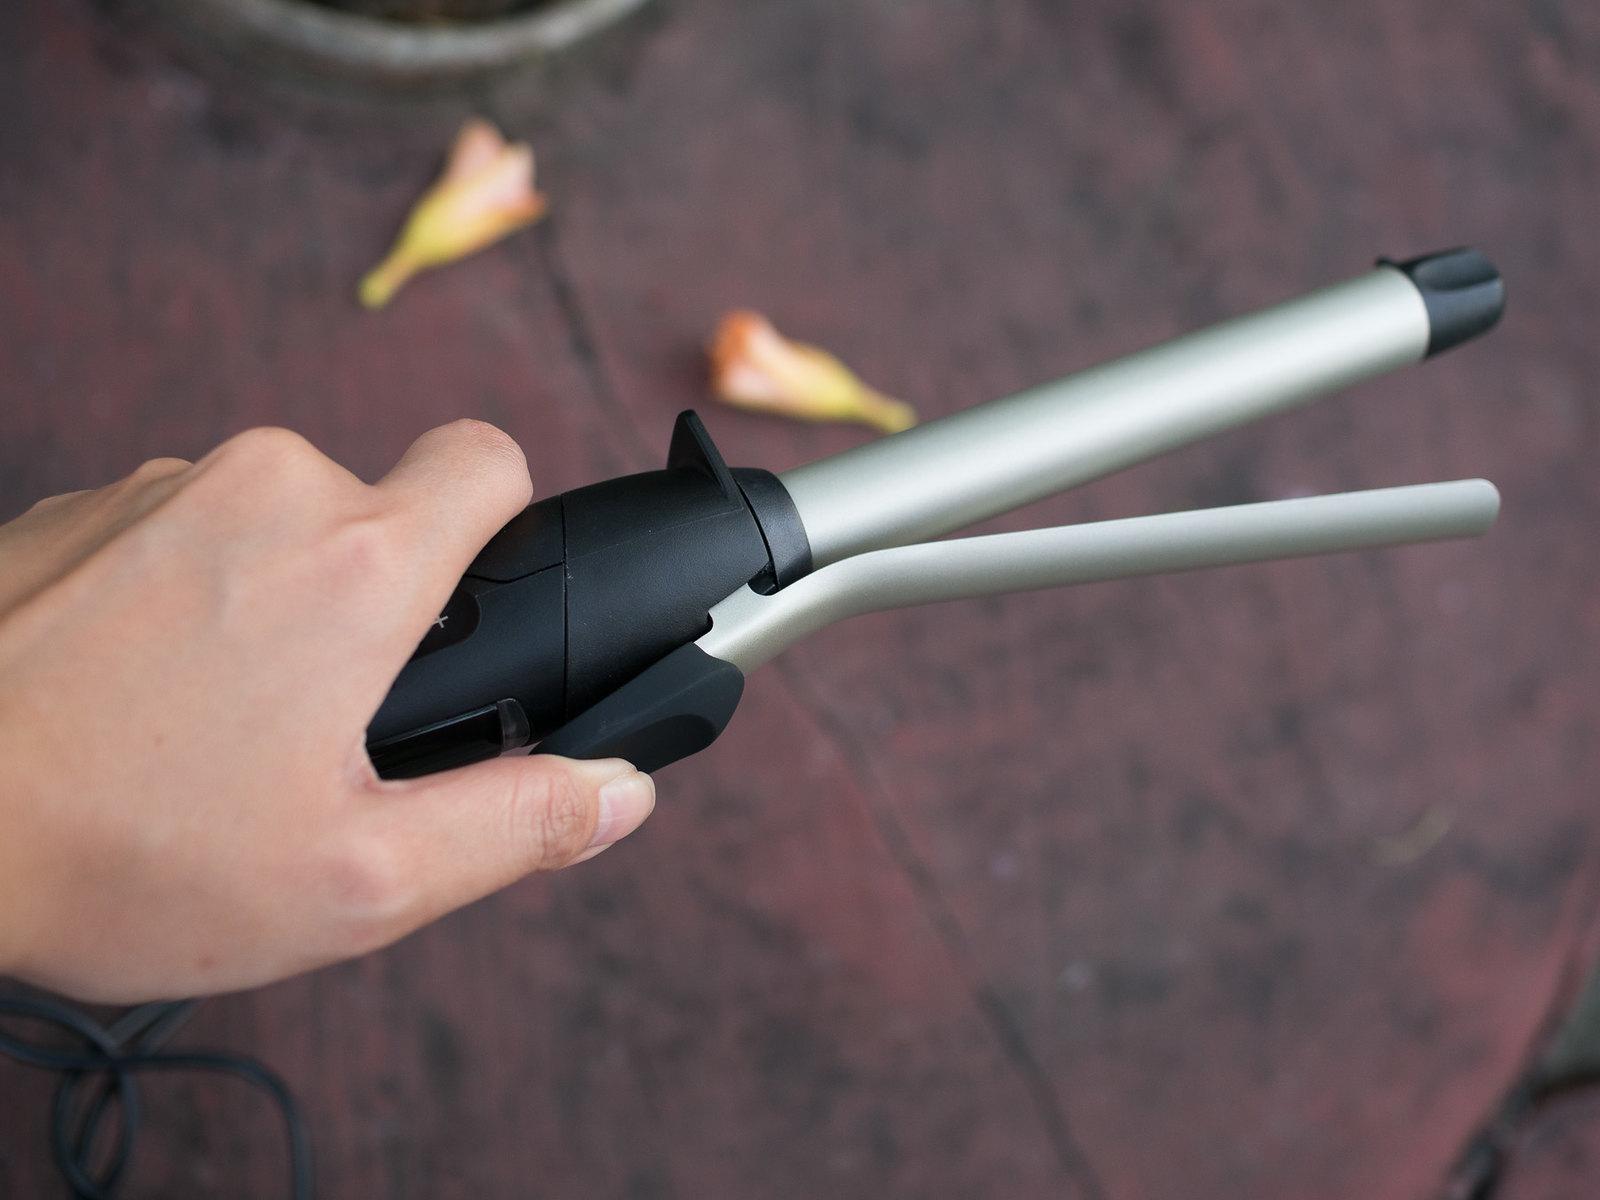 remington-curler-product-review